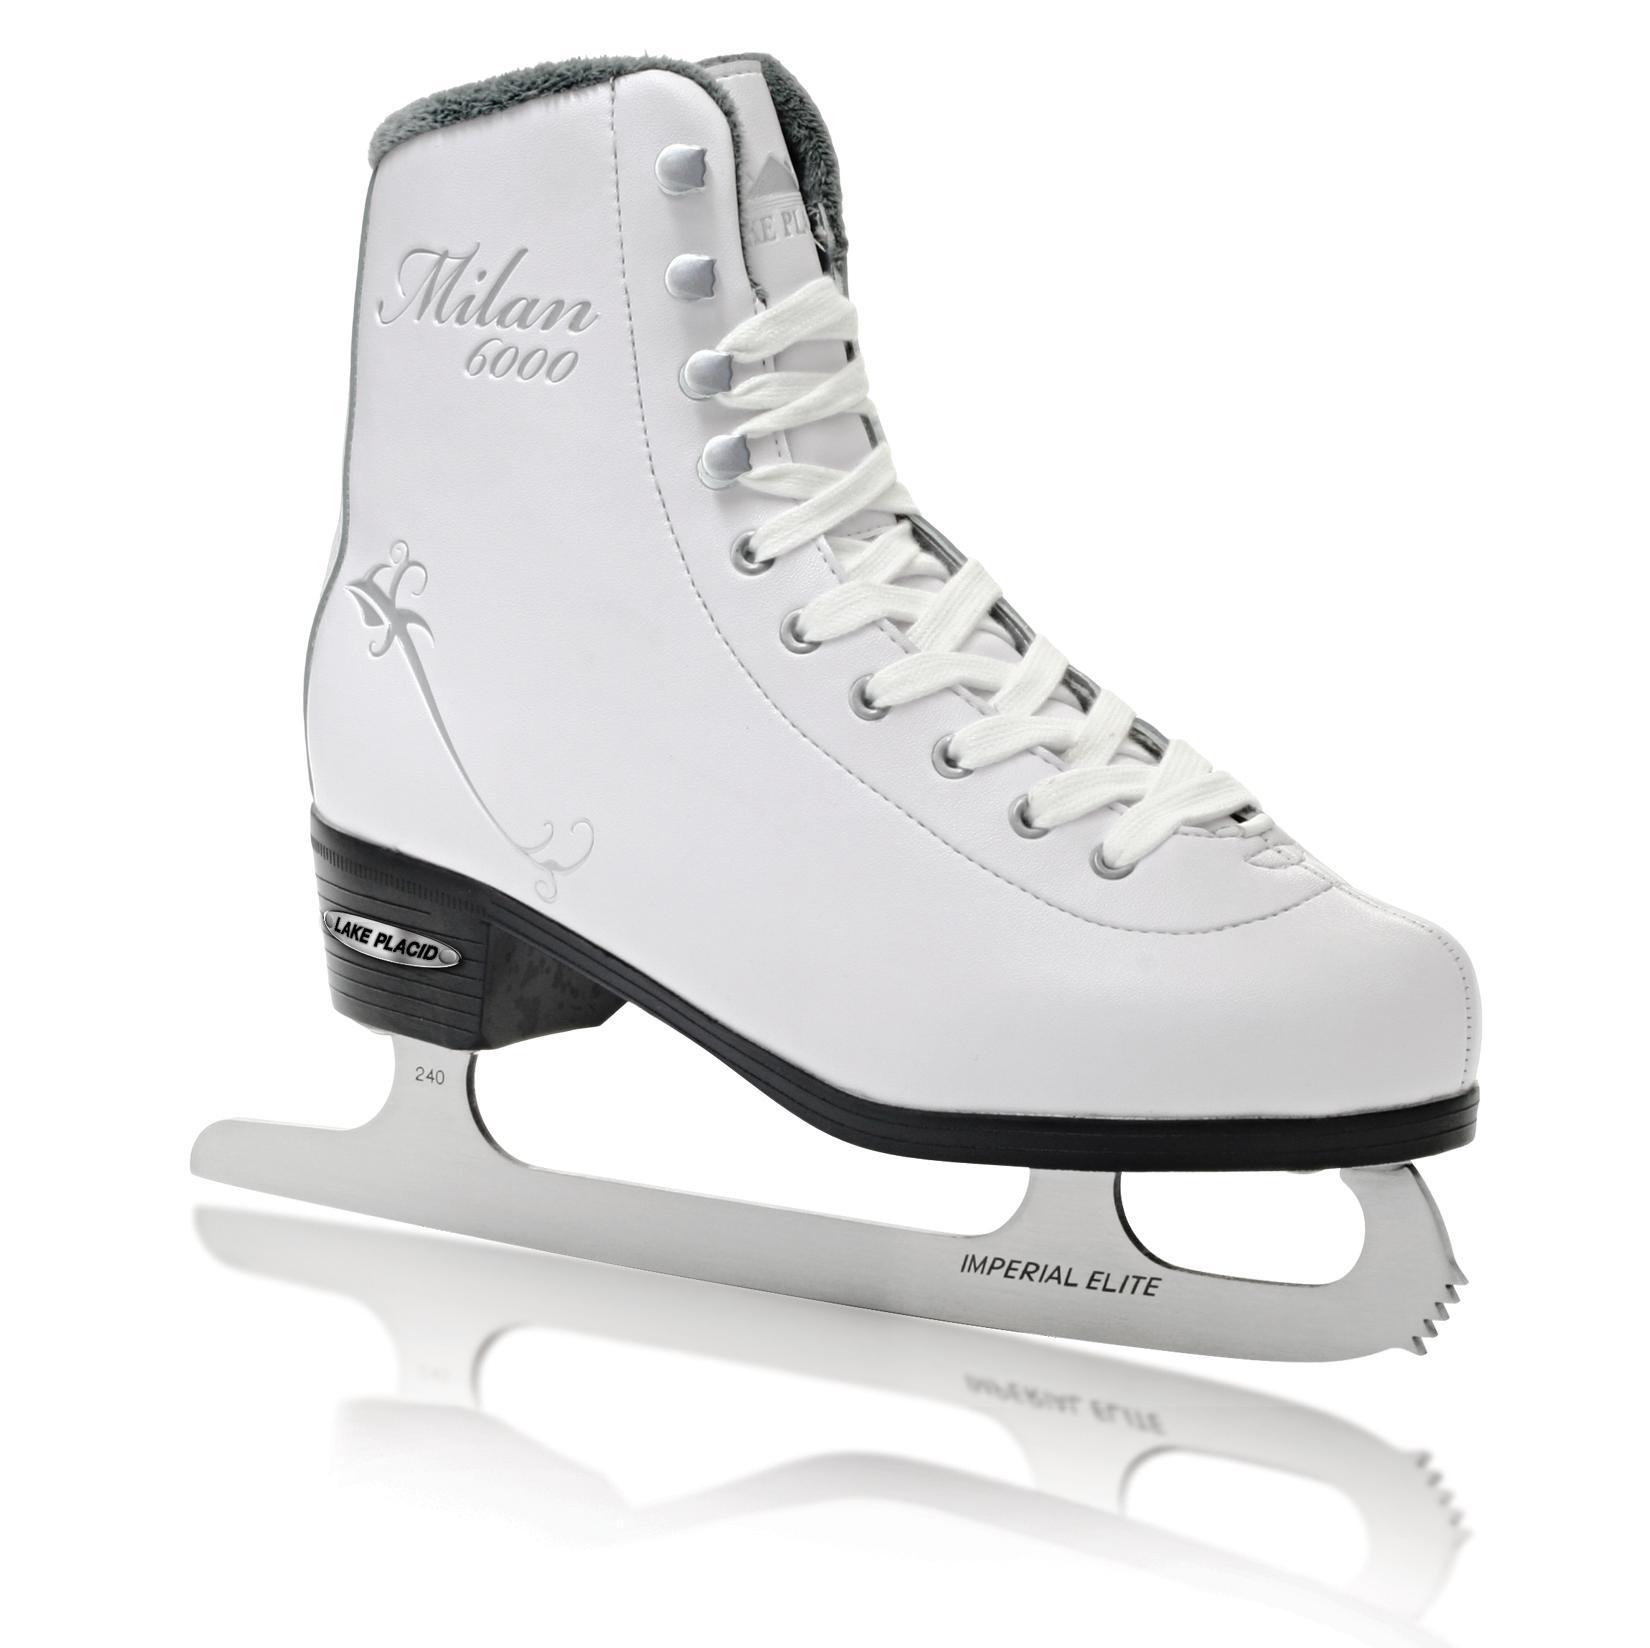 Milan 6000 Traditional Figure Ice Skate